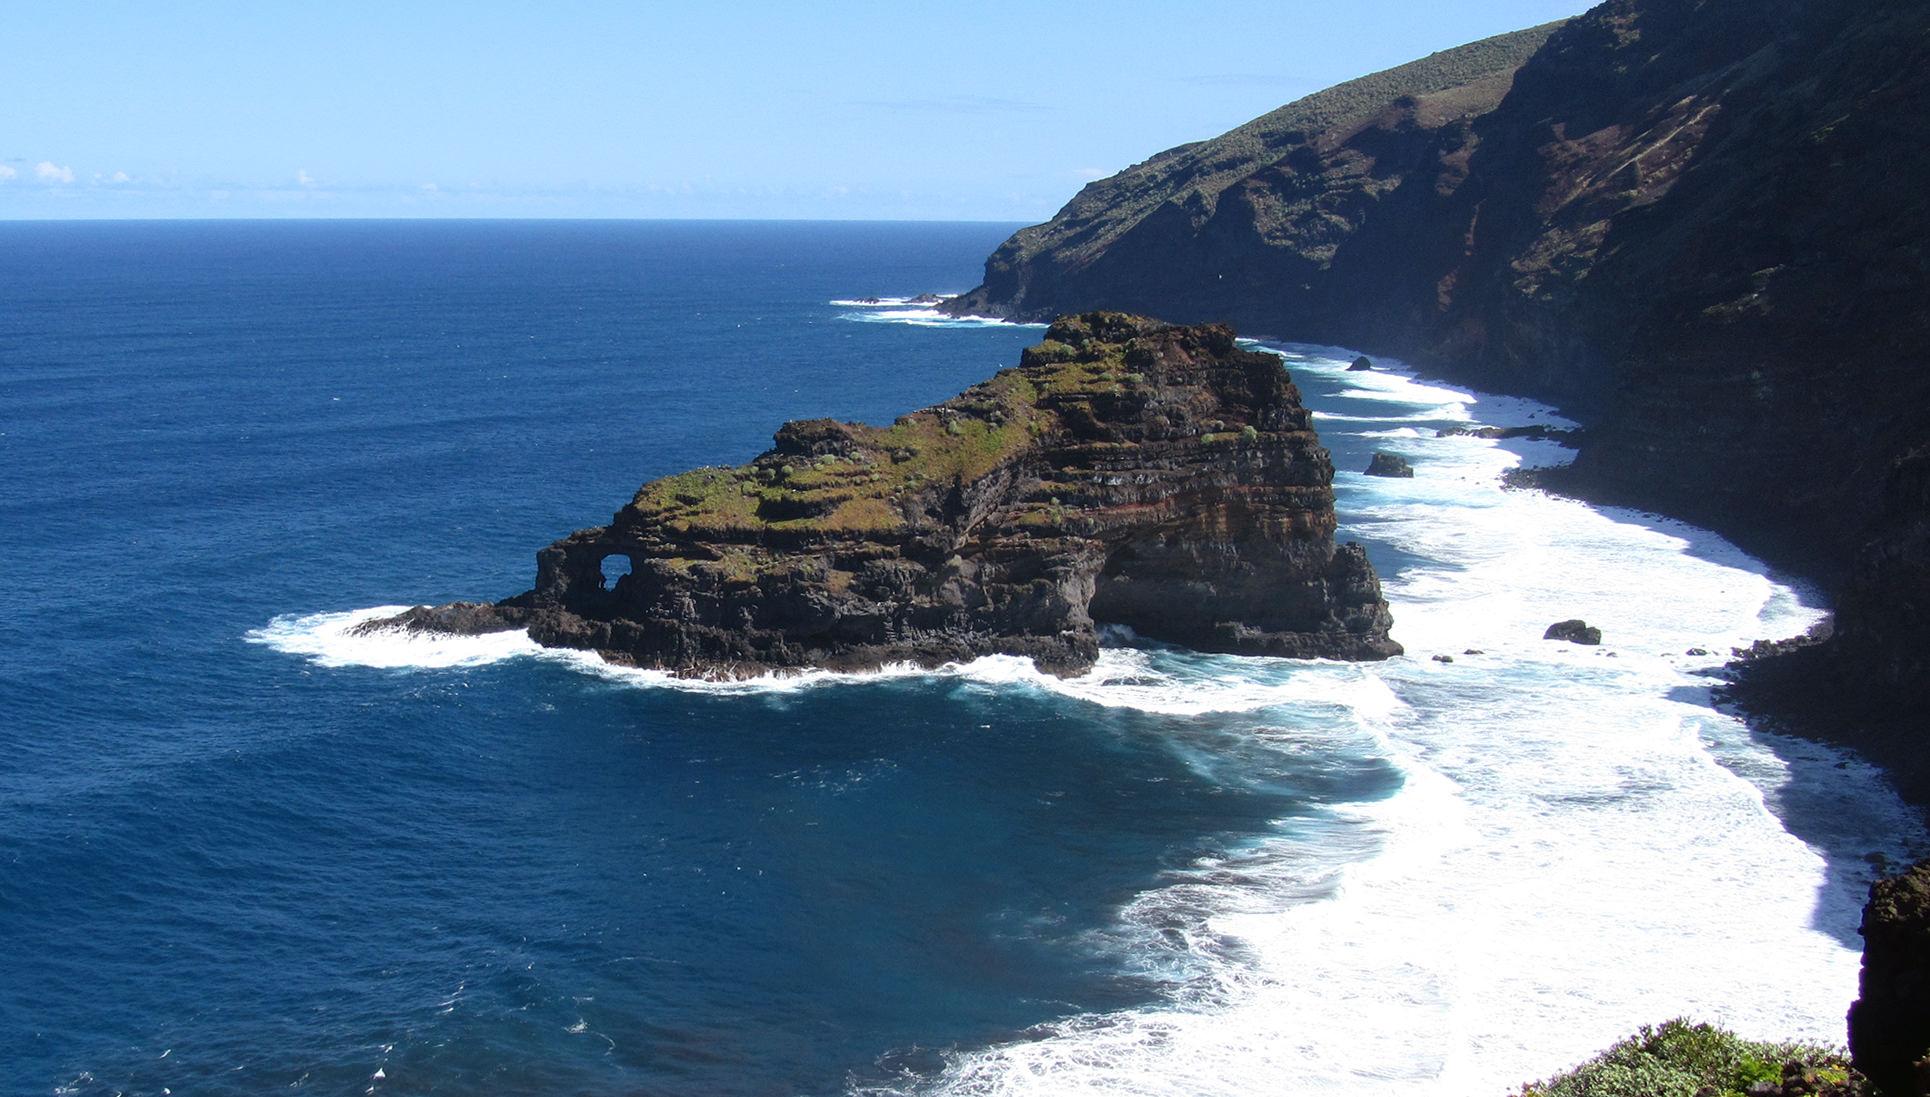 le spiaggie più belle de la Palma Canarie bujaren